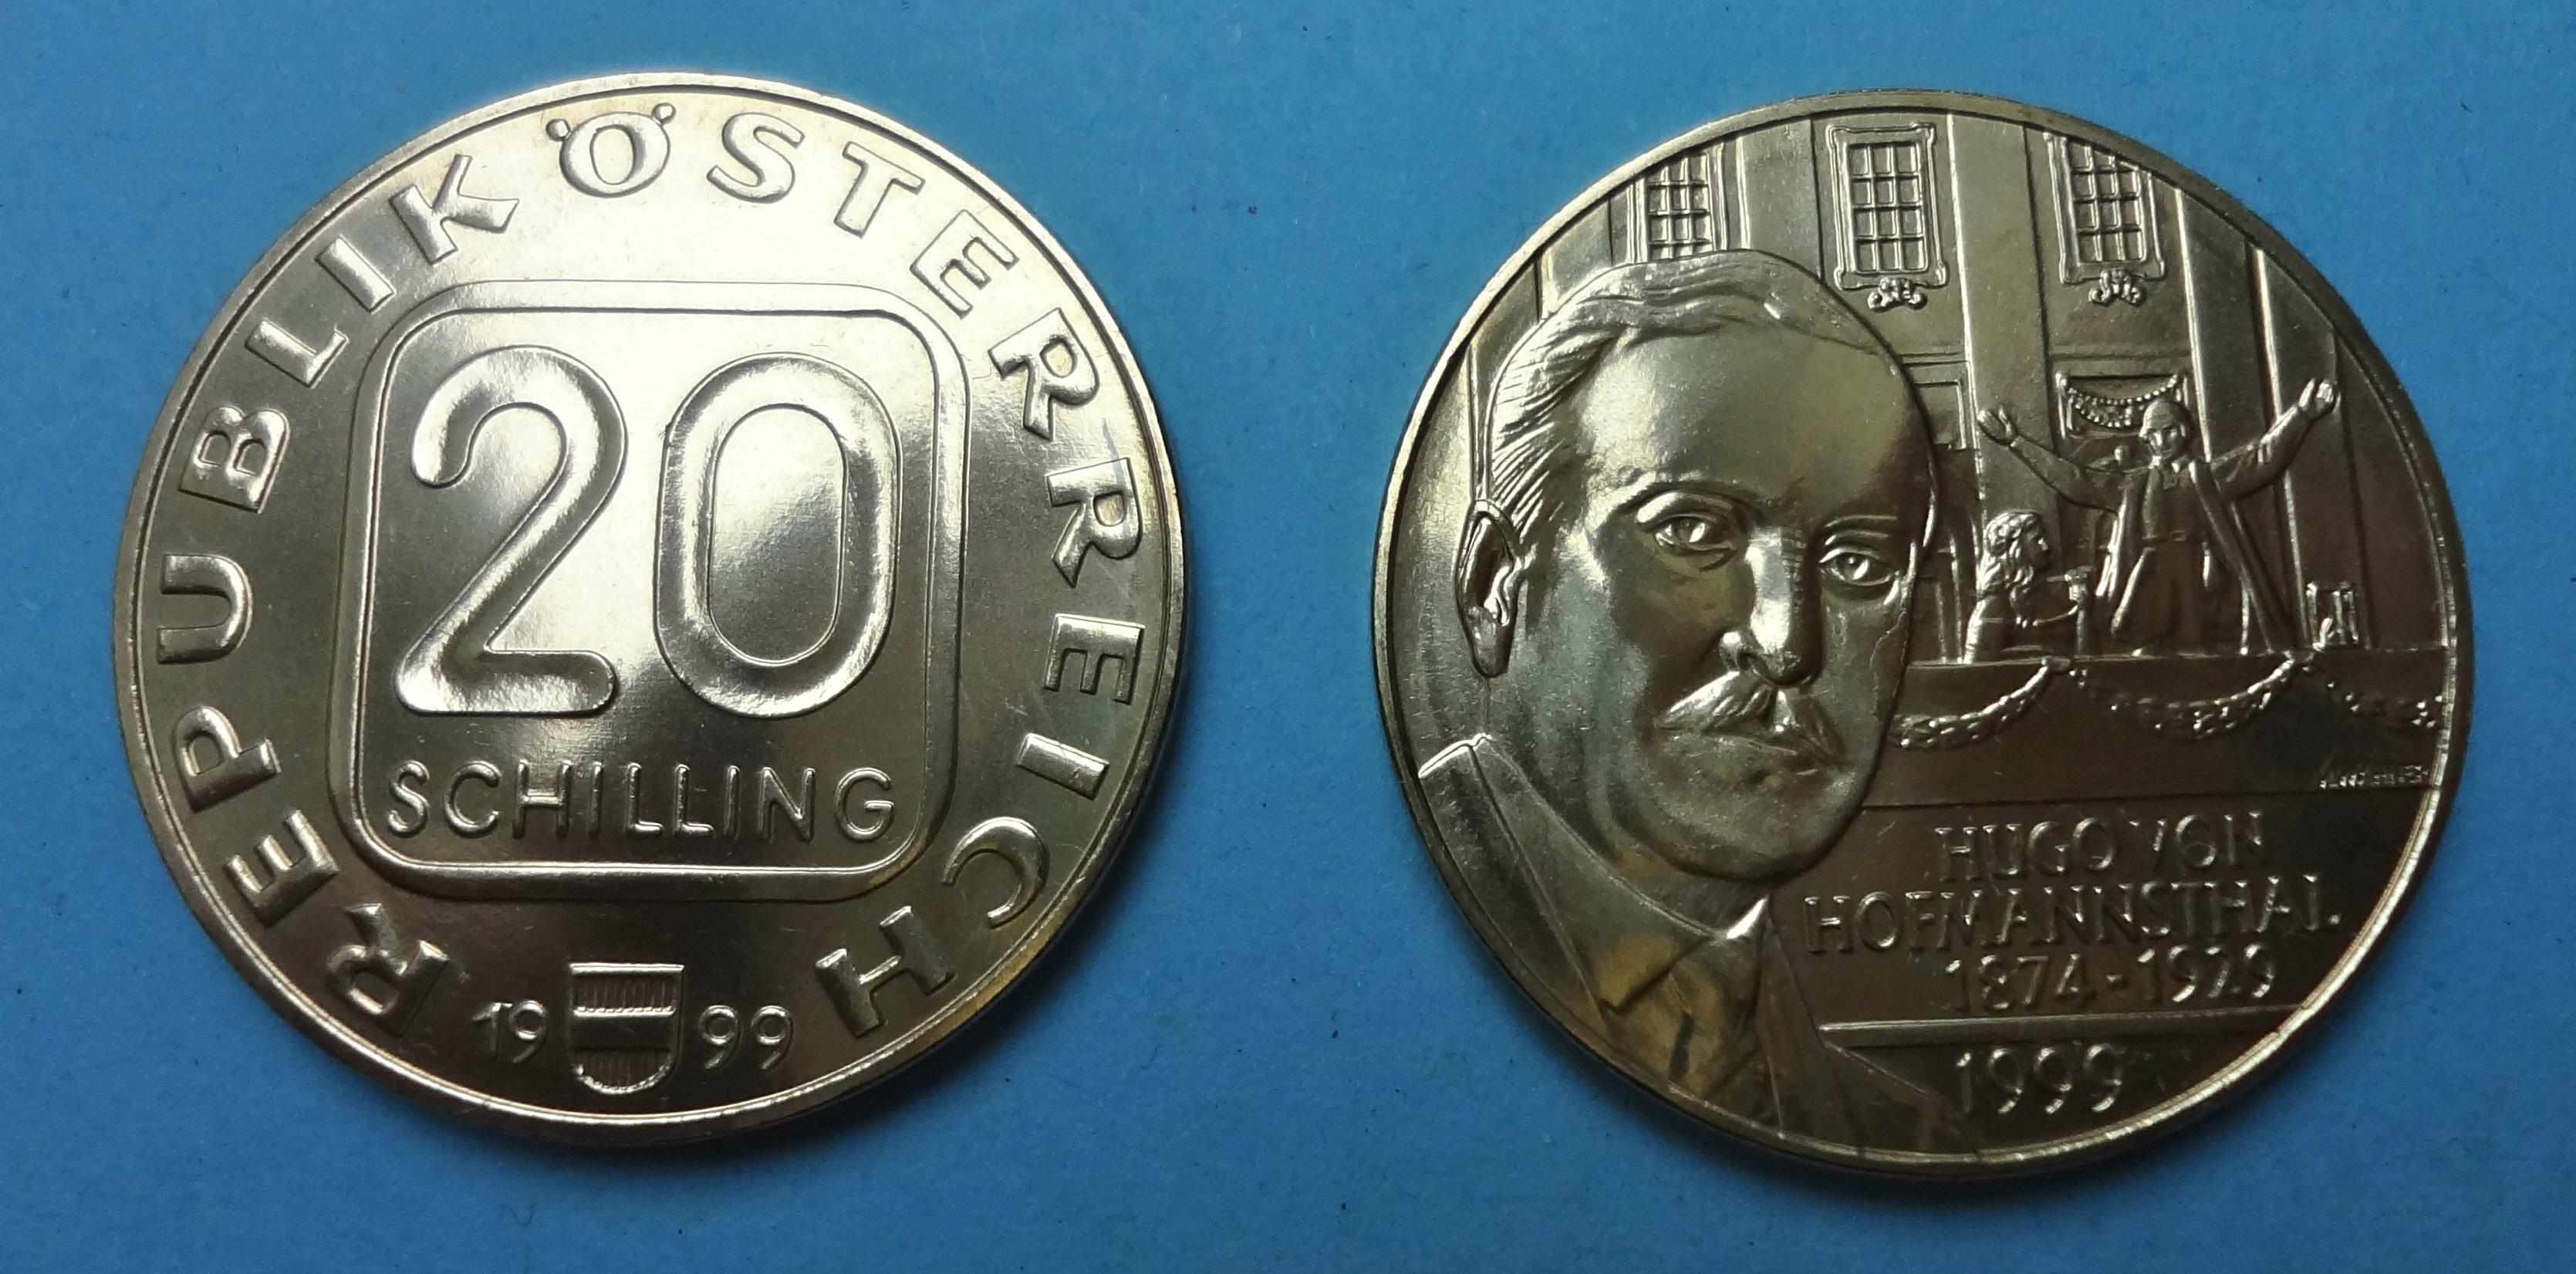 20 Schilling Münze 1999 Hofmannsthal Muenzhandel Kissercom